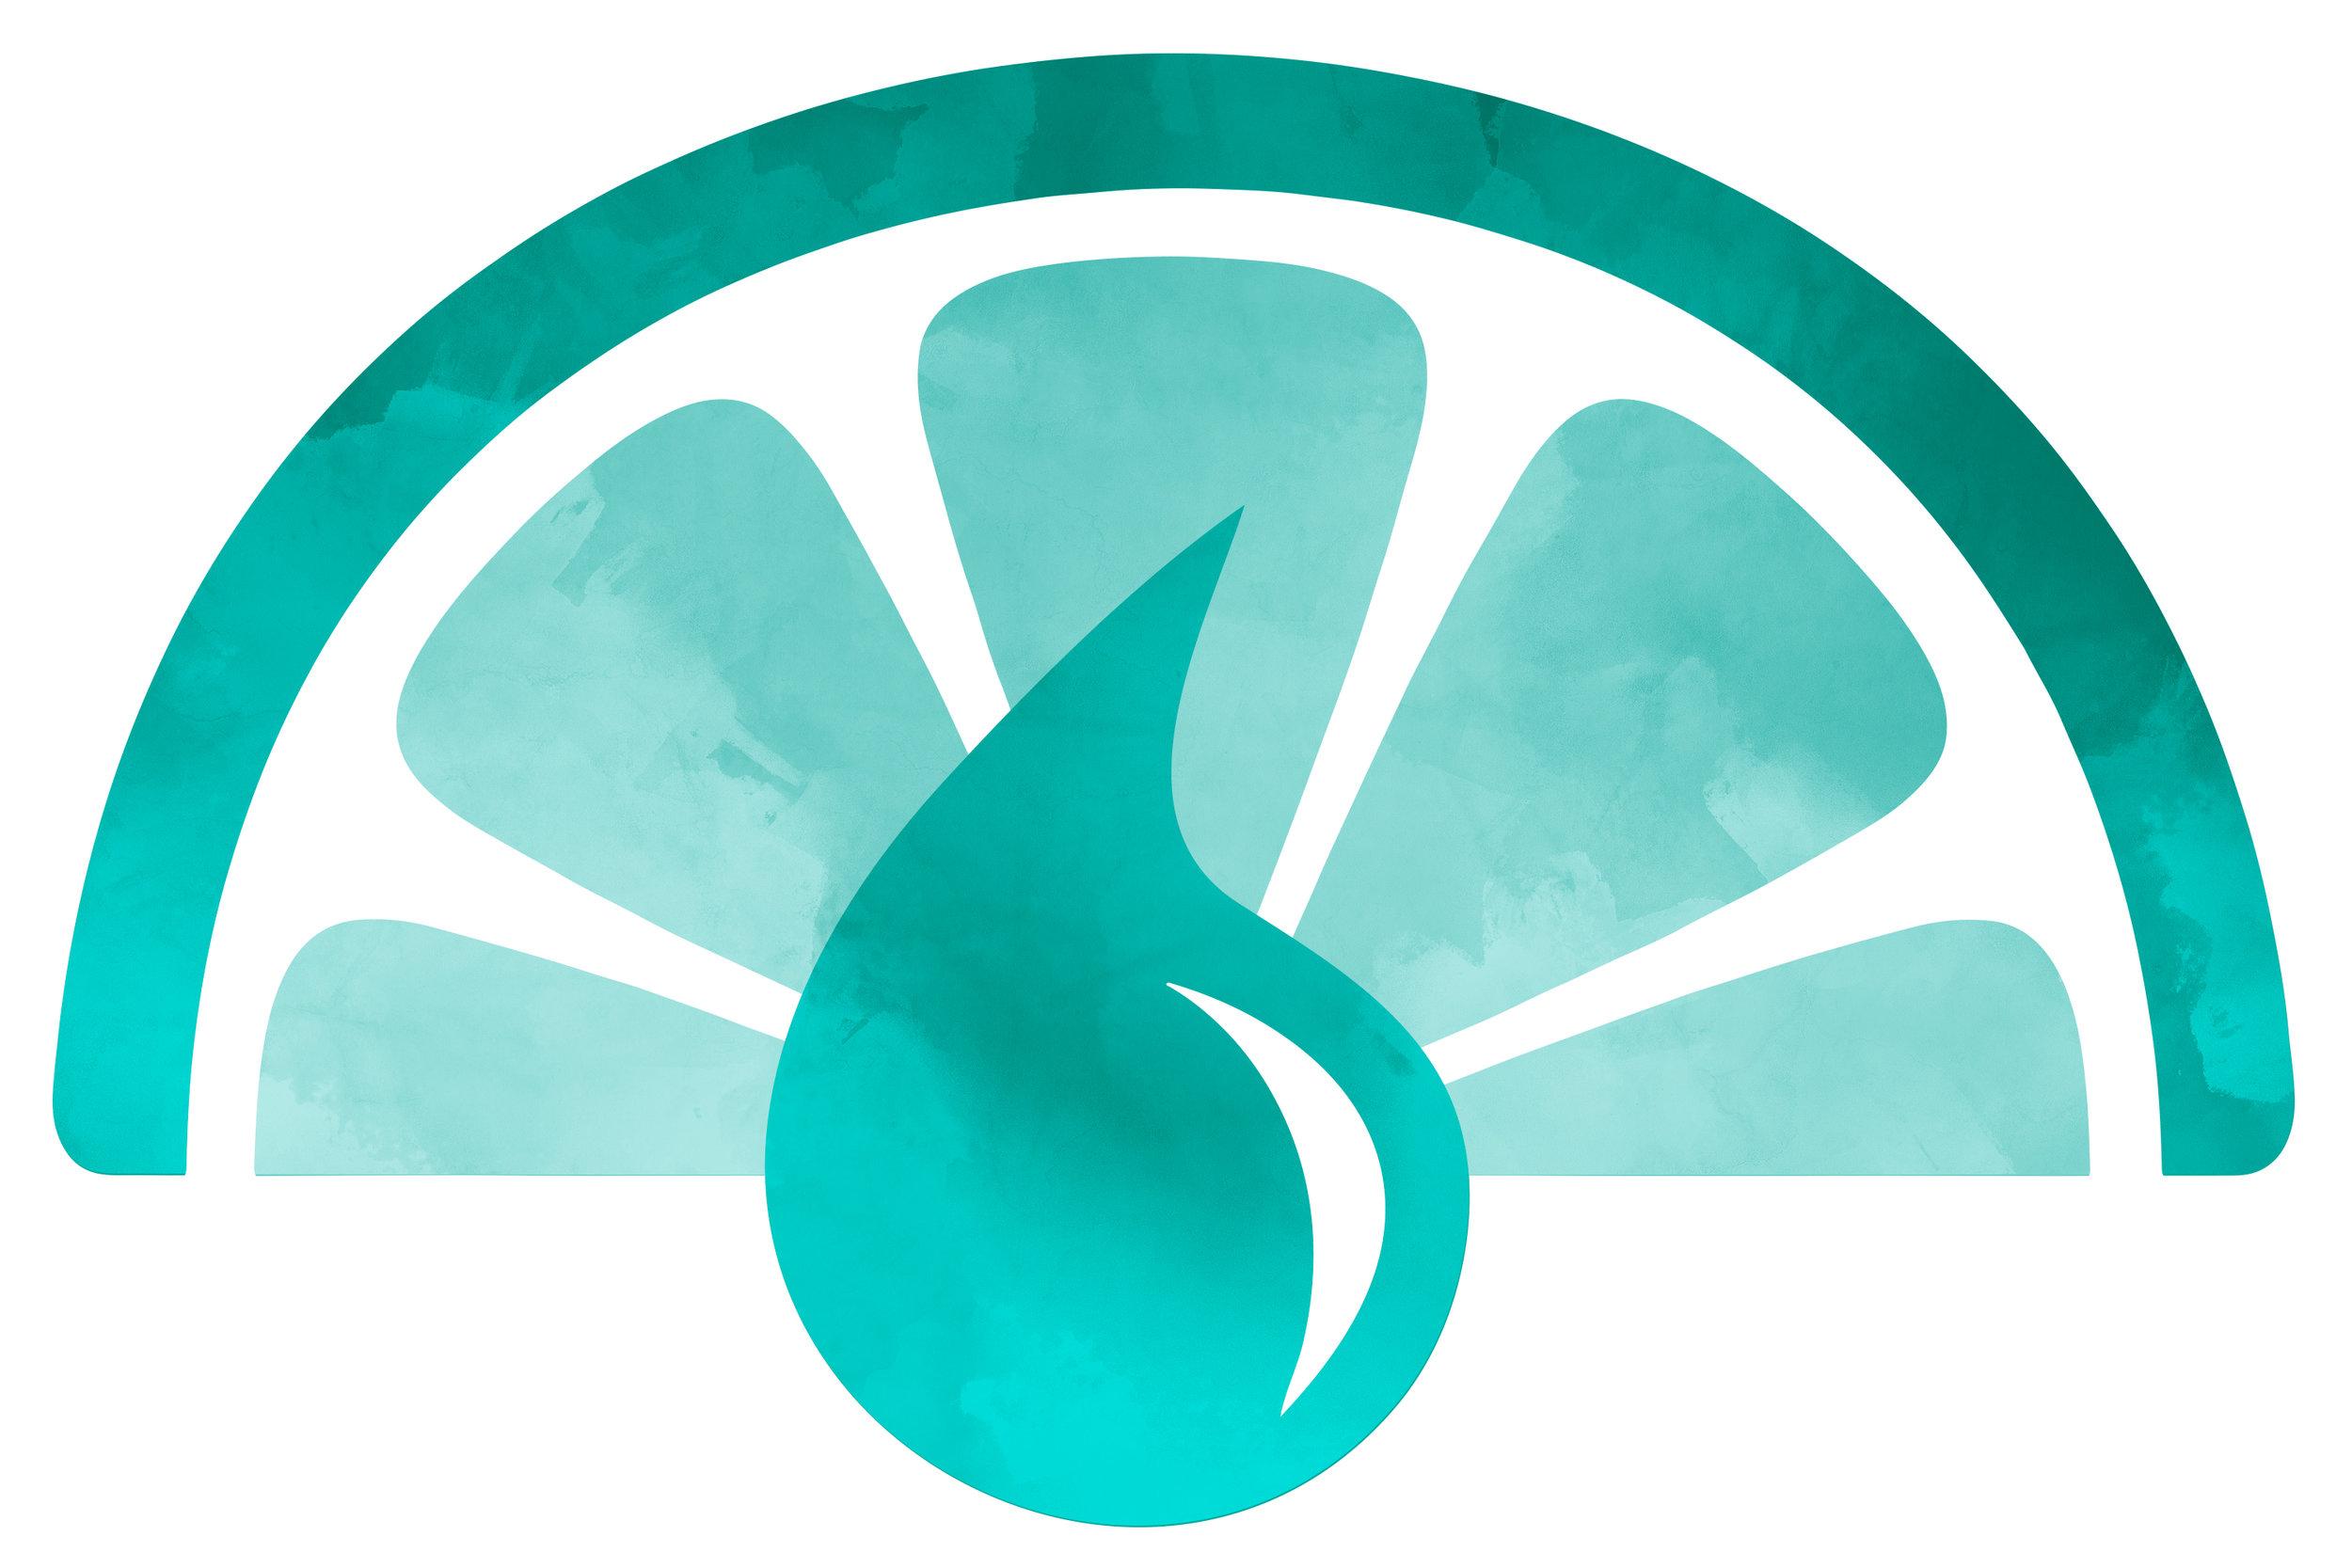 DJL_logos-texture-blue.jpg